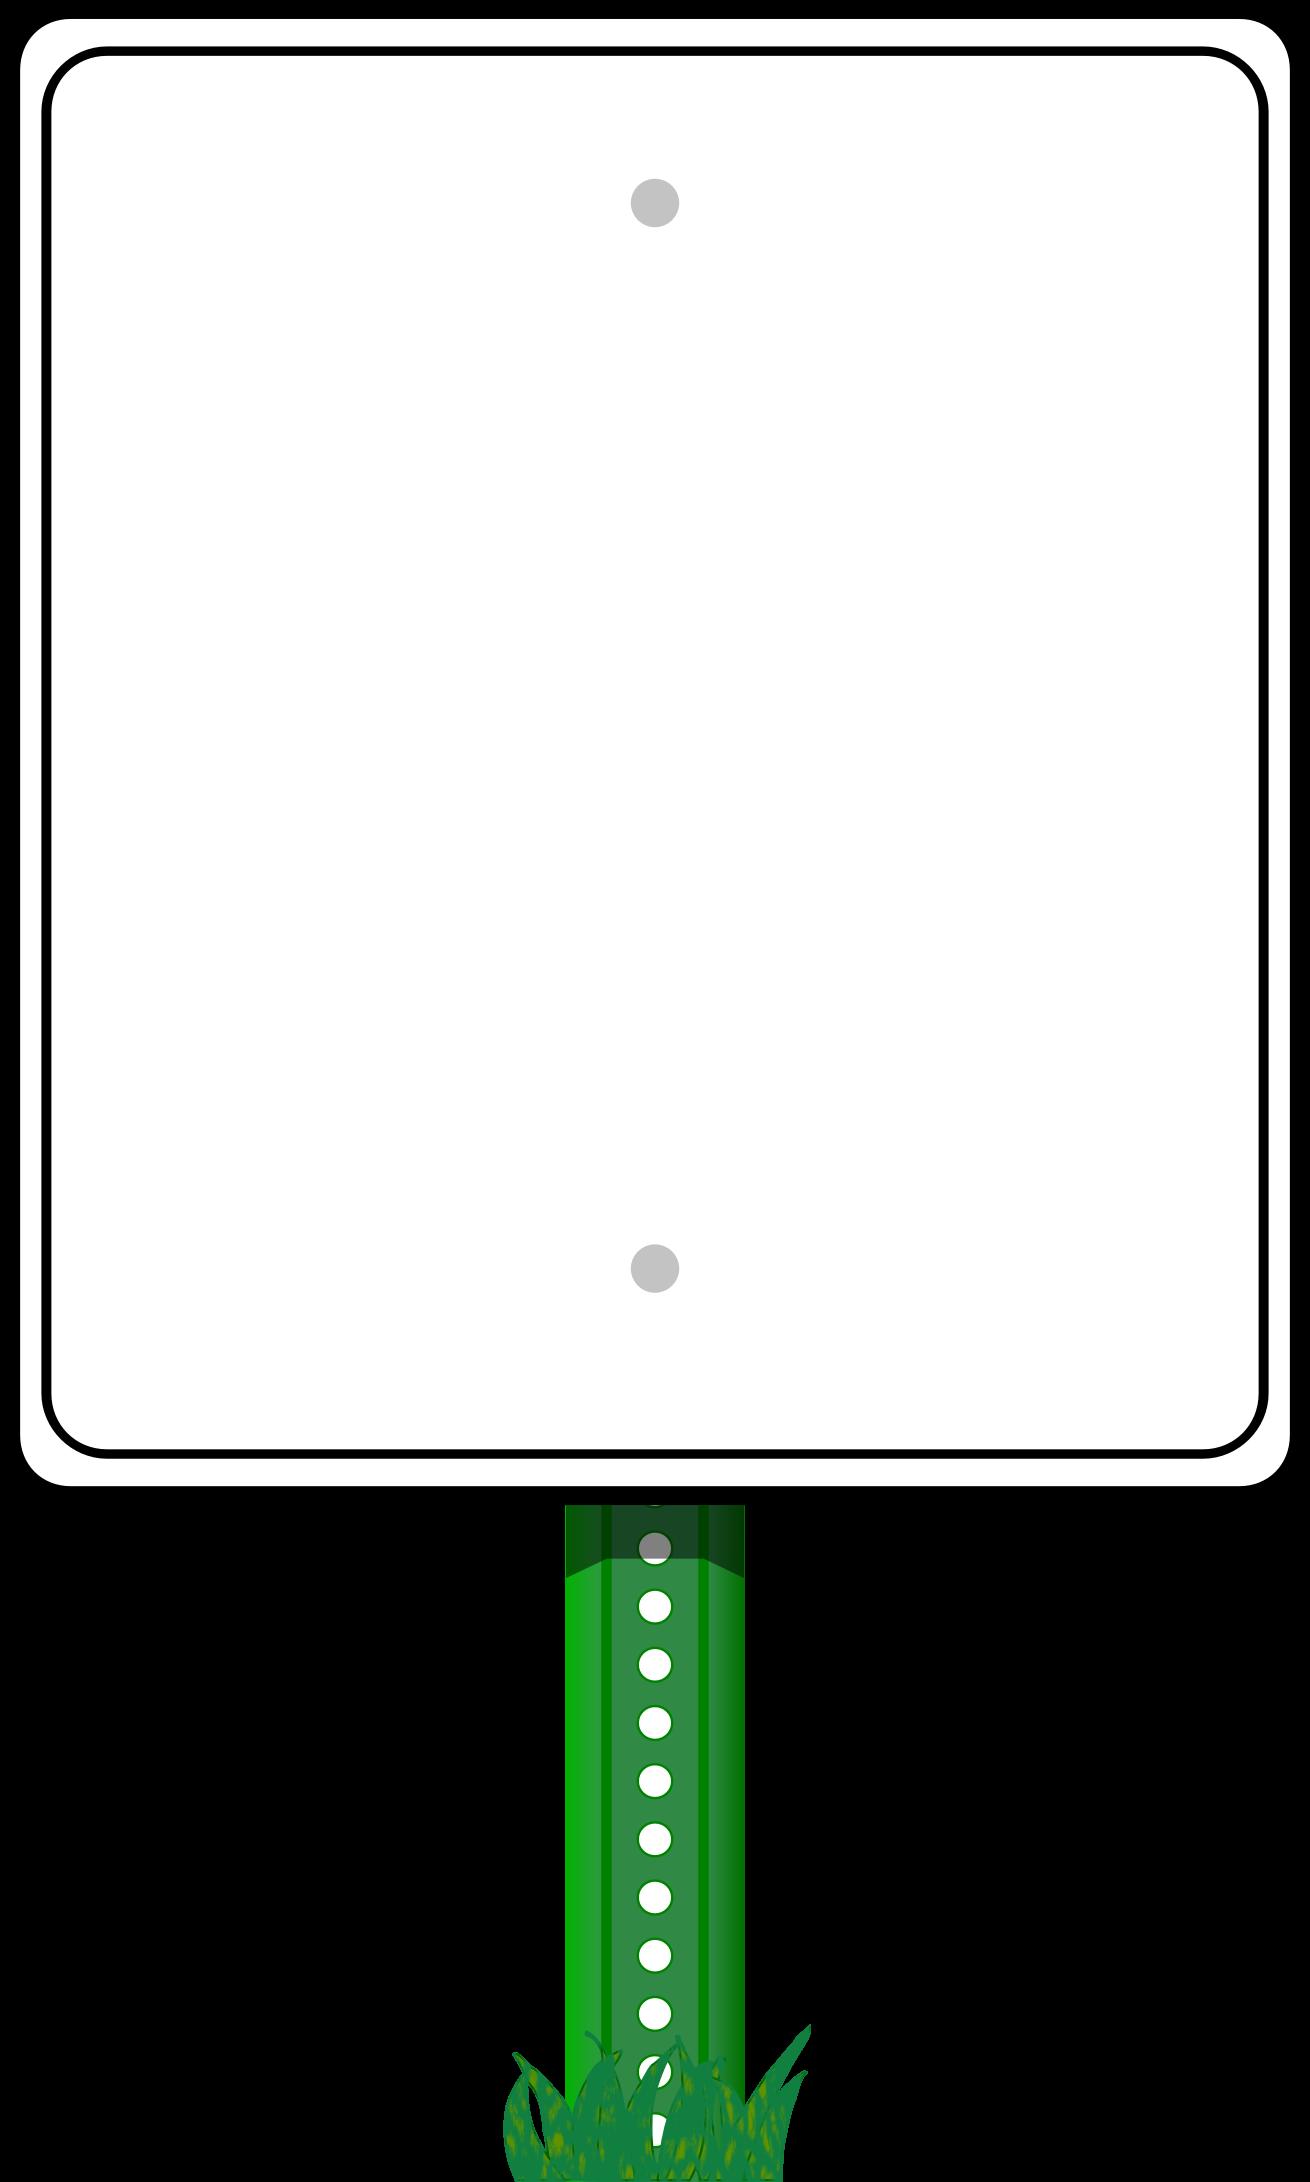 vector freeuse Road sign border big. Page clipart horizontal